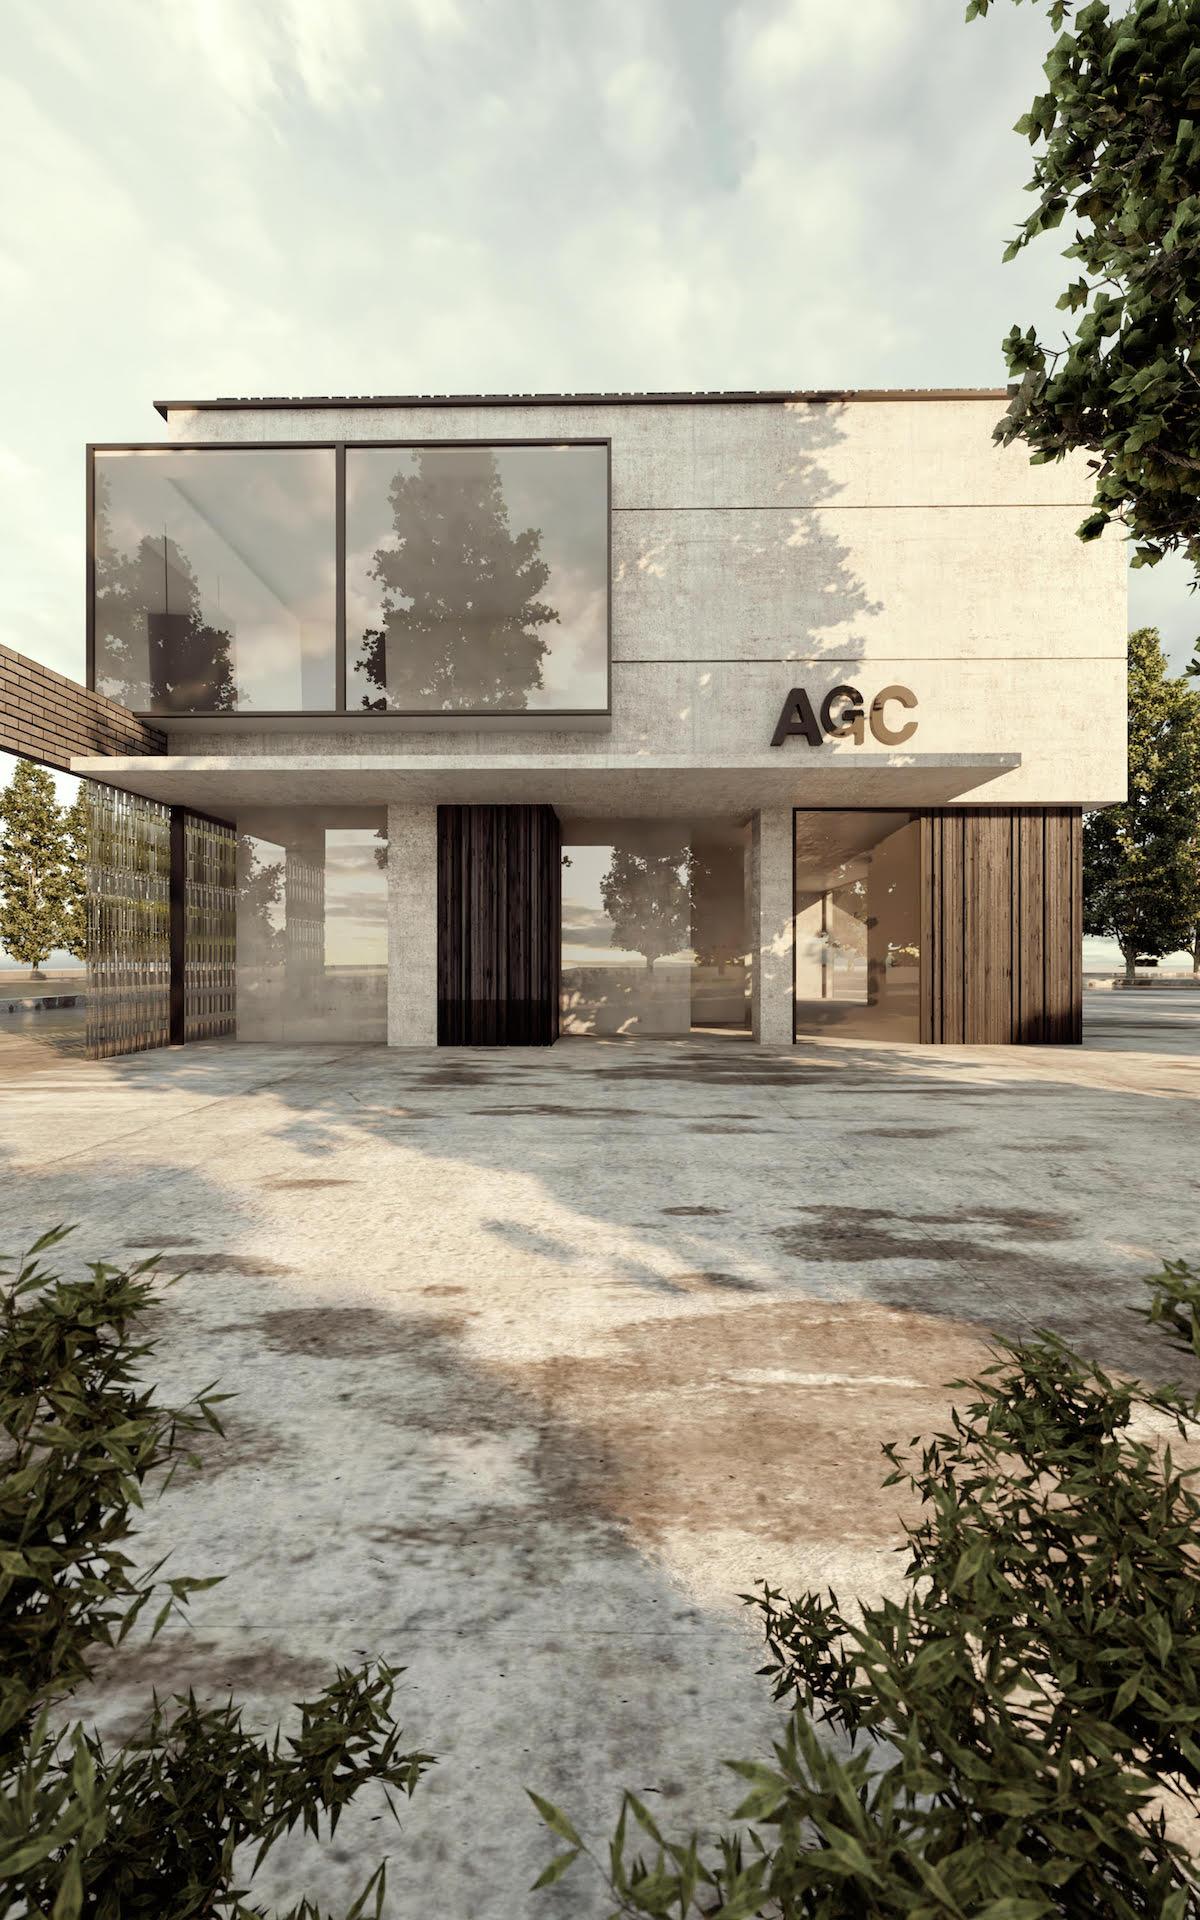 AGC exterior rendering